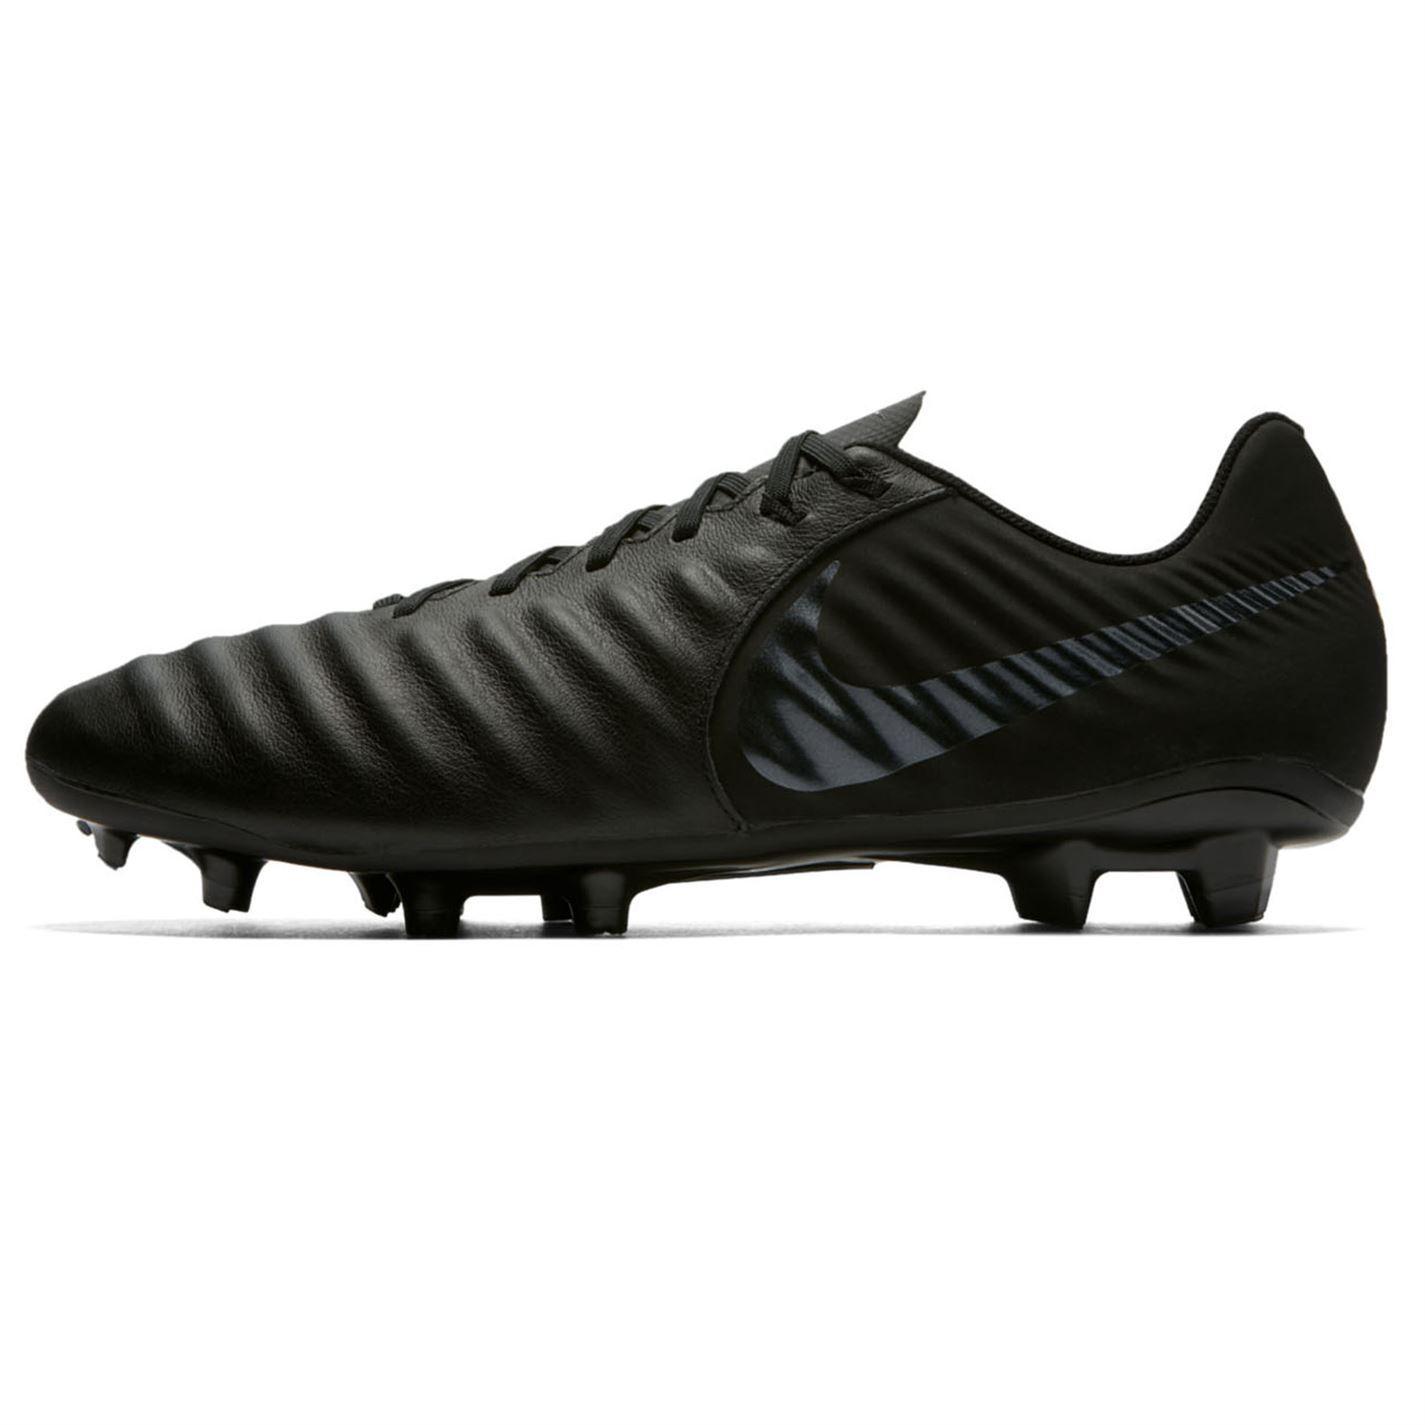 miniature 3 - Nike-Tiempo-Legend-Academy-FG-Firm-Ground-Chaussures-De-Football-Homme-Football-Chaussures-Crampons